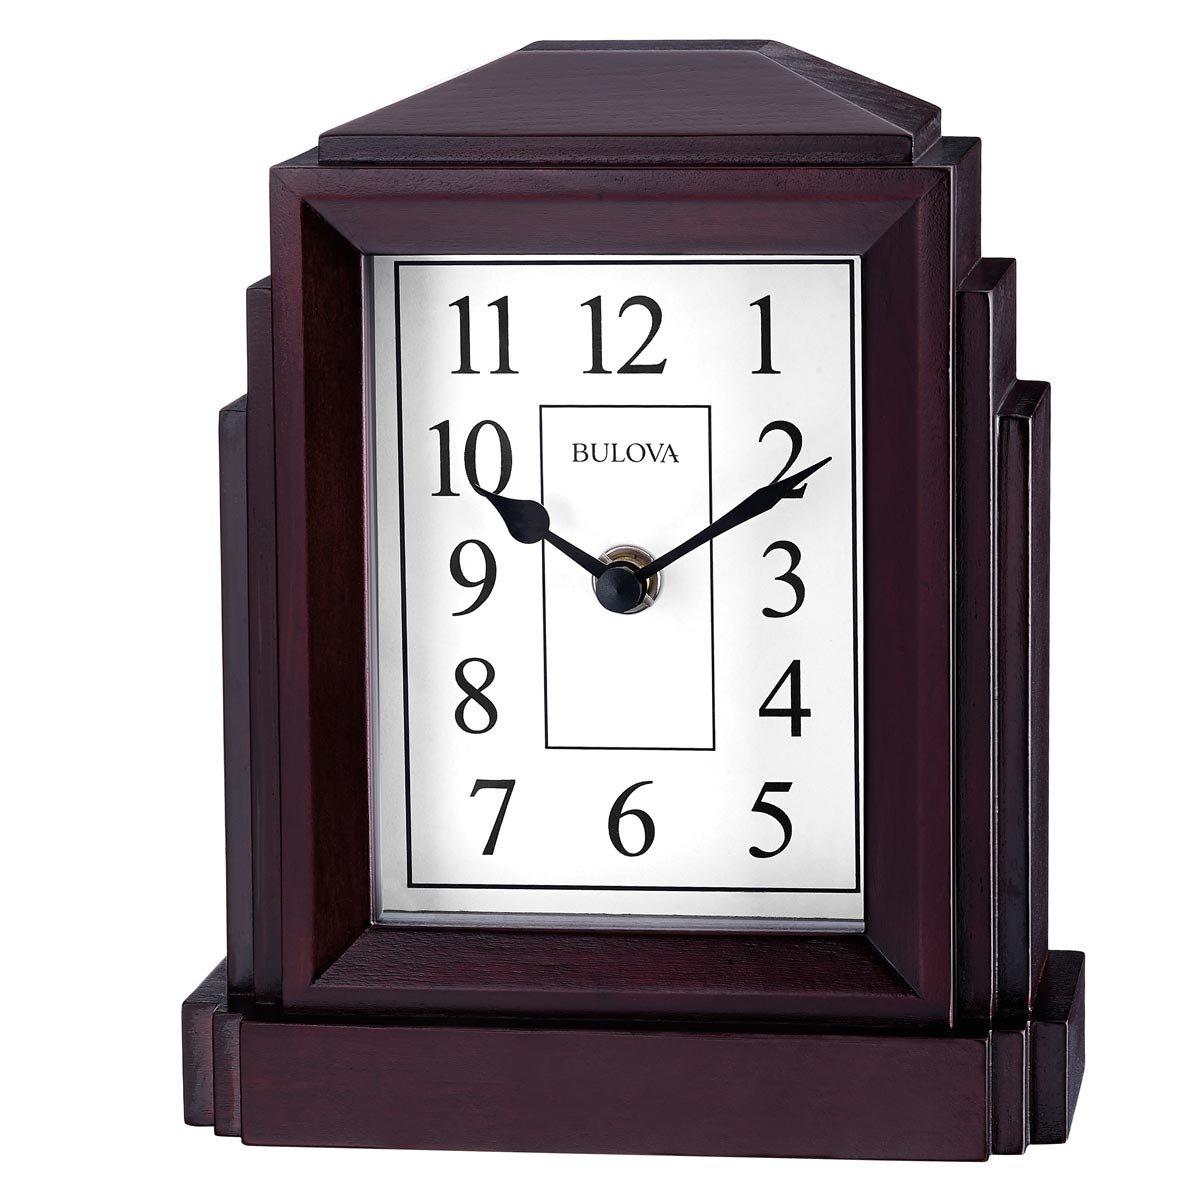 Bulova Empire Mantel Clock